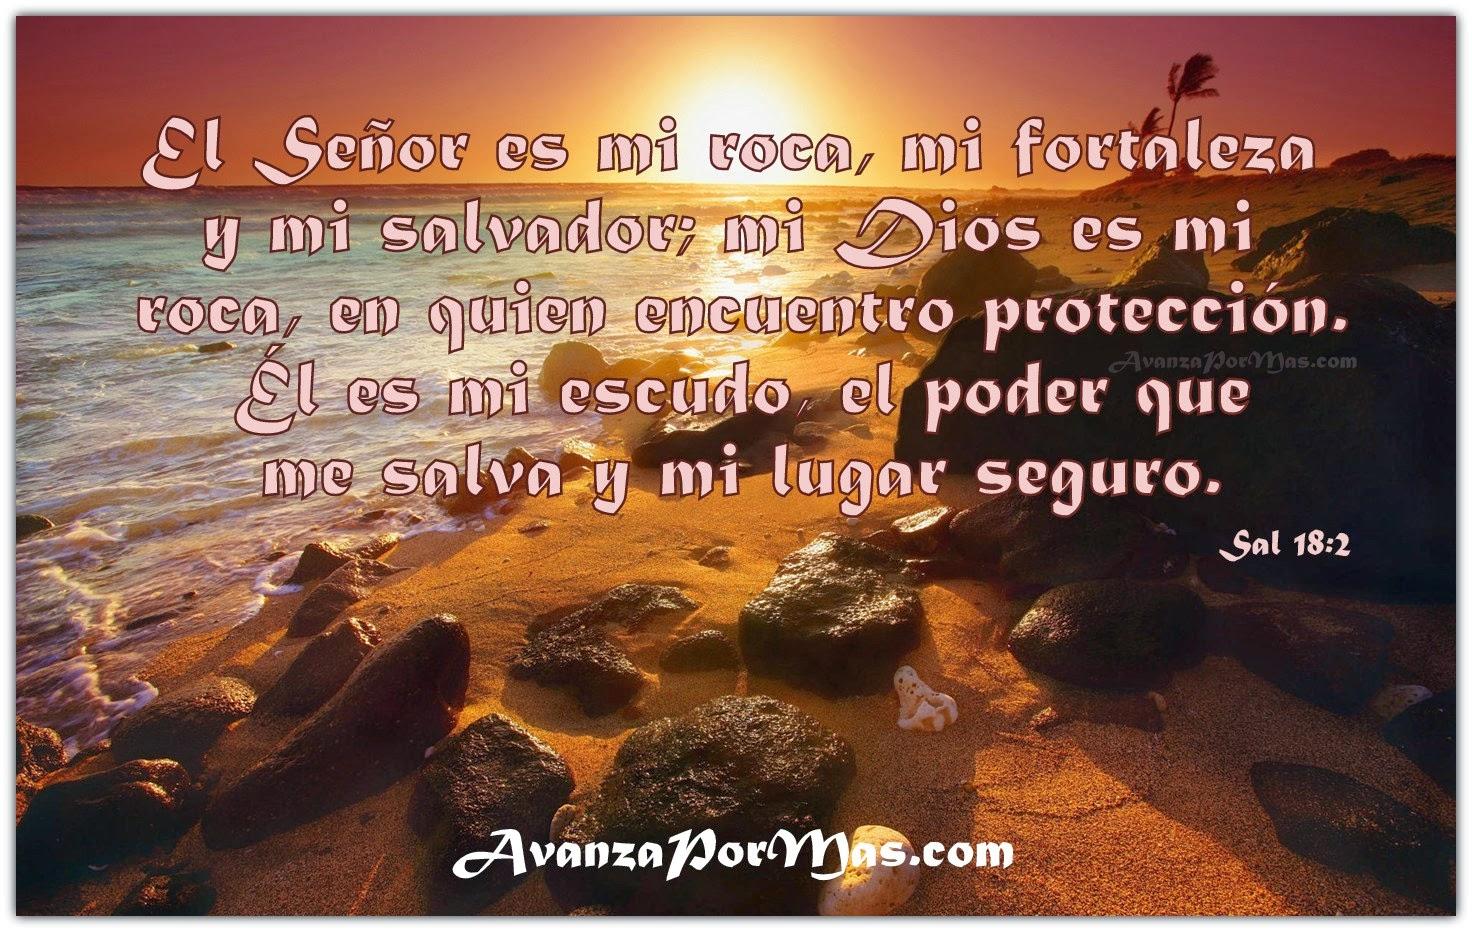 ImagenesCristianasConVersiculosElSenorEsMiRoca